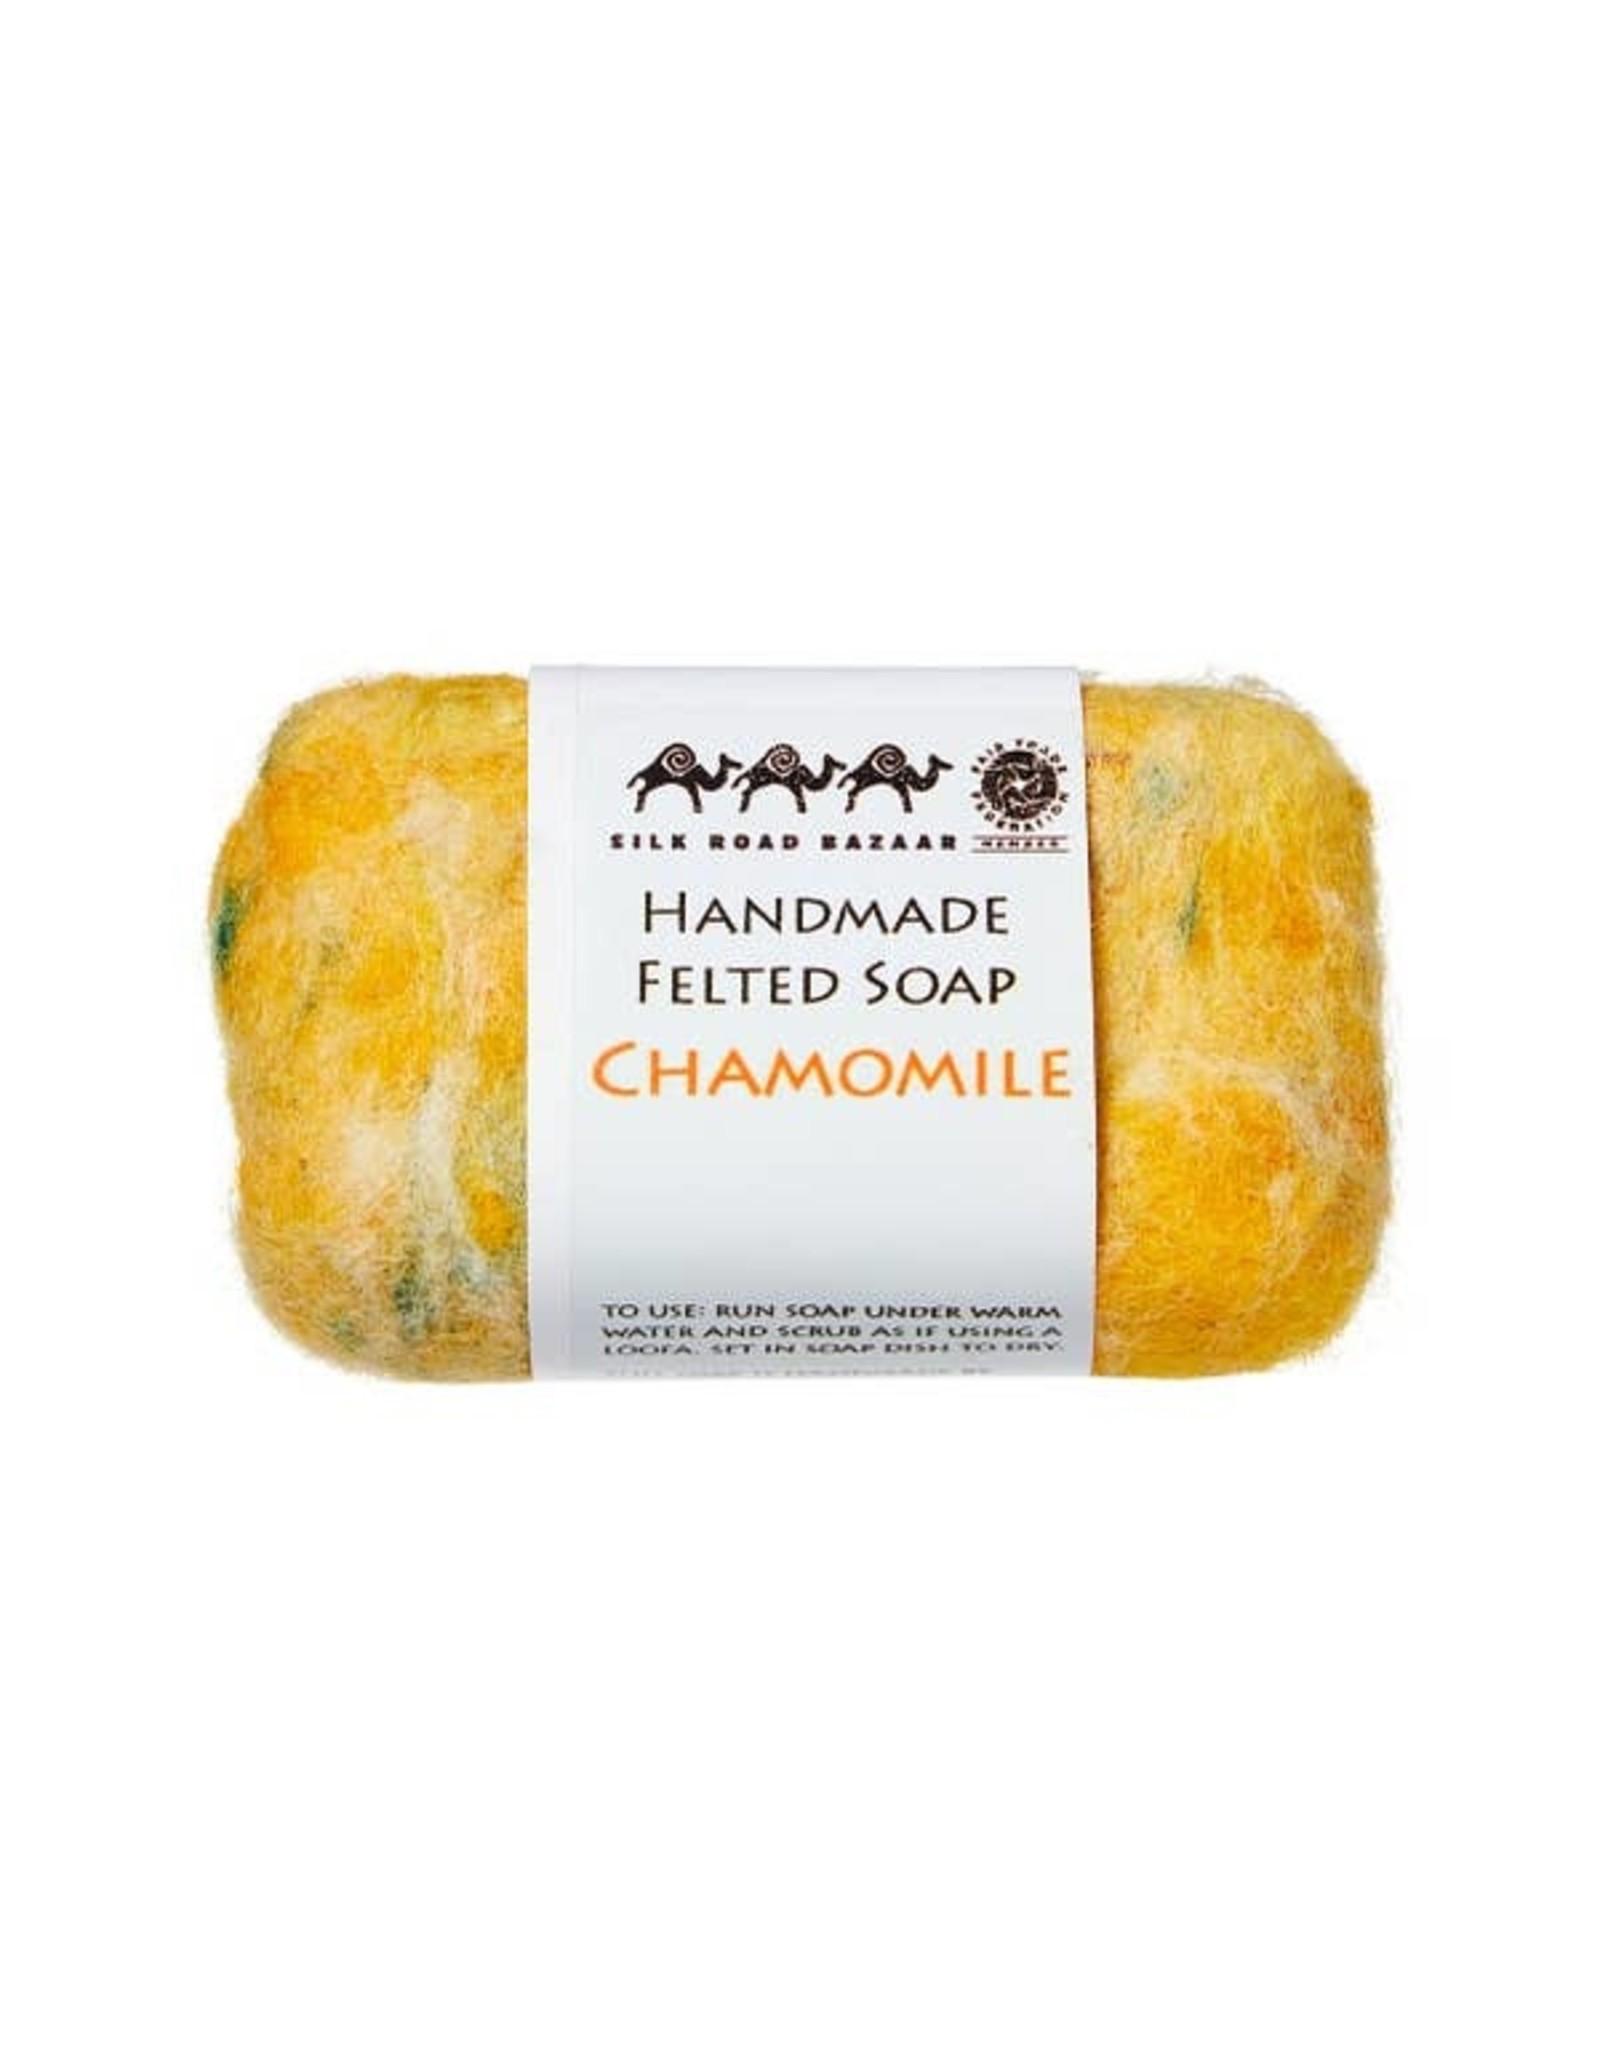 Silk Road Bazaar Chamomile Handmade Felted Soap